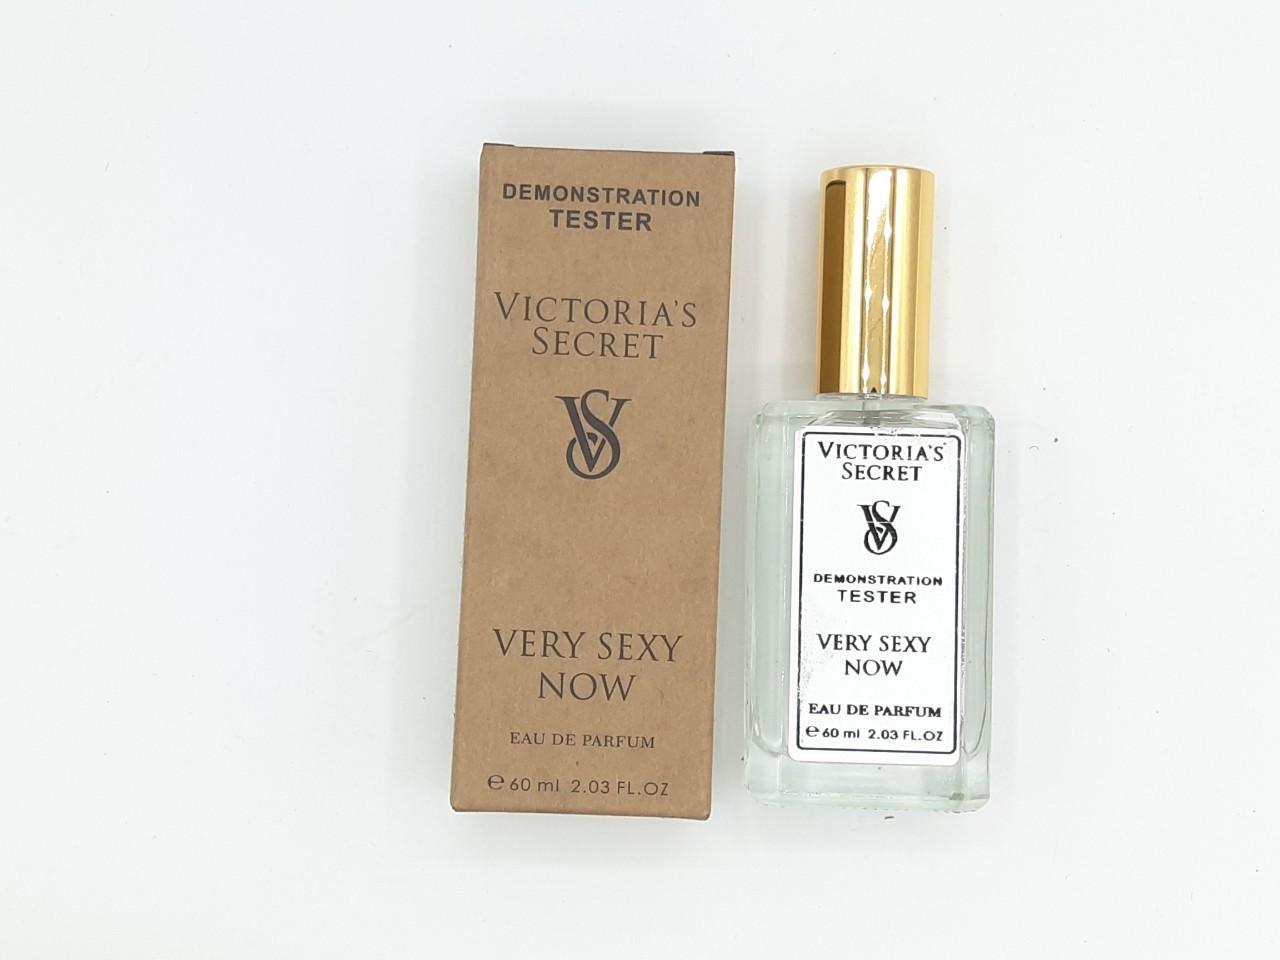 Жіночий тестер Victoria's Secret Very Sexy Now